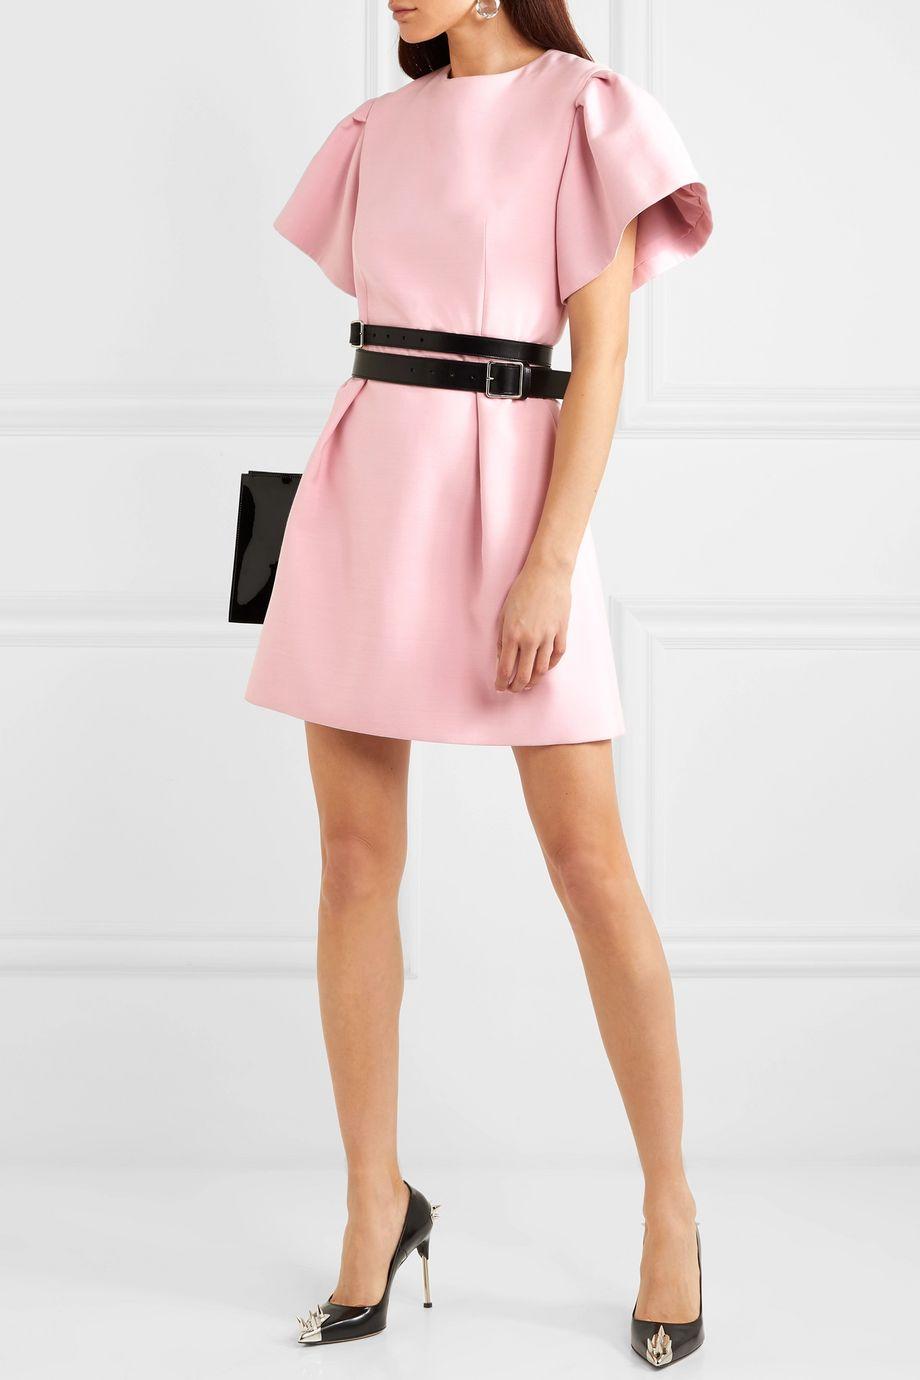 Alexander McQueen Wool-blend crepe mini dress